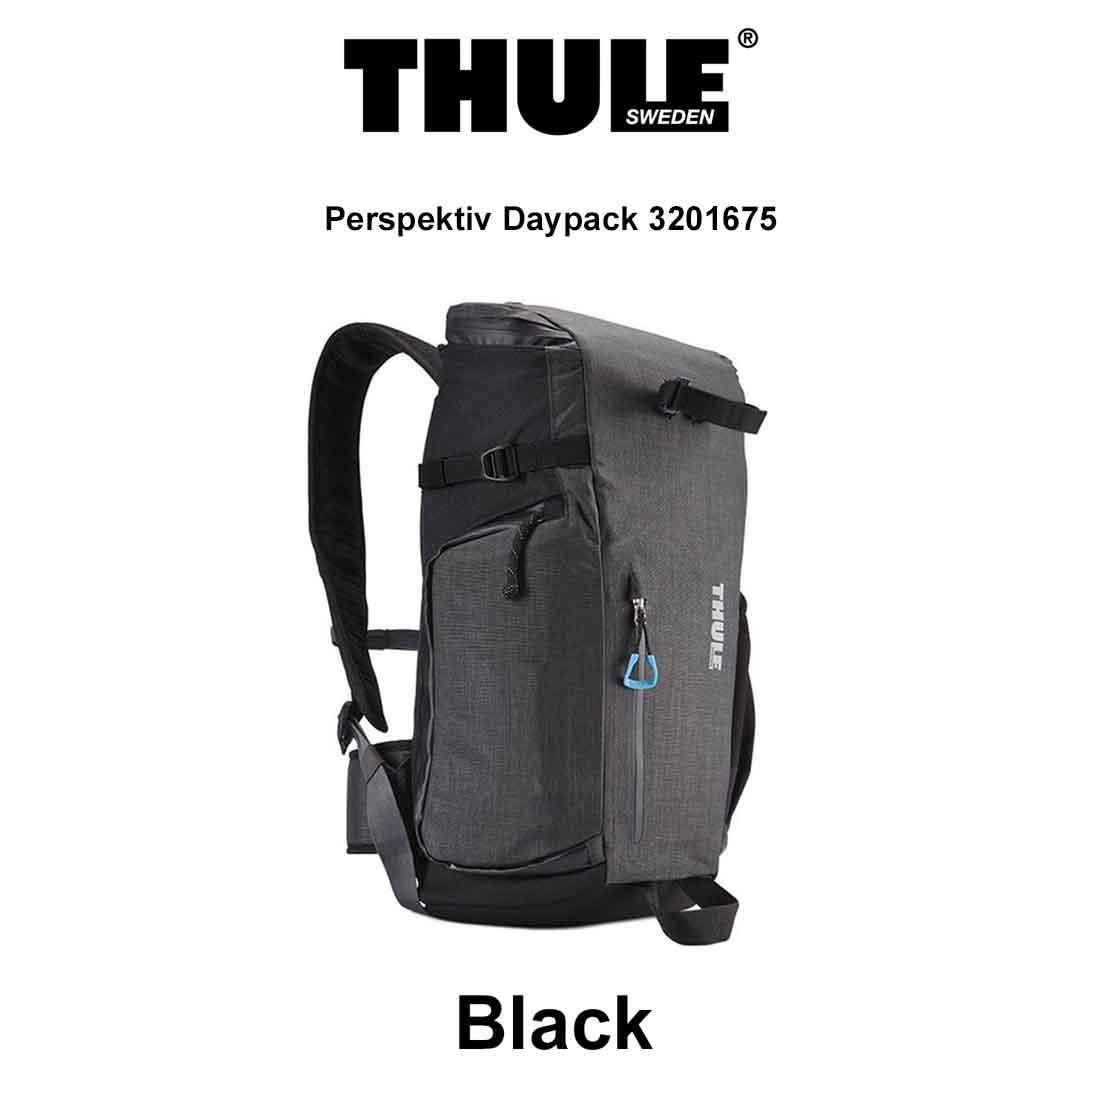 THULE(スーリー)カメラ バックパック リュック バッグ パースペクティブ Perspektiv Daypack 3201675